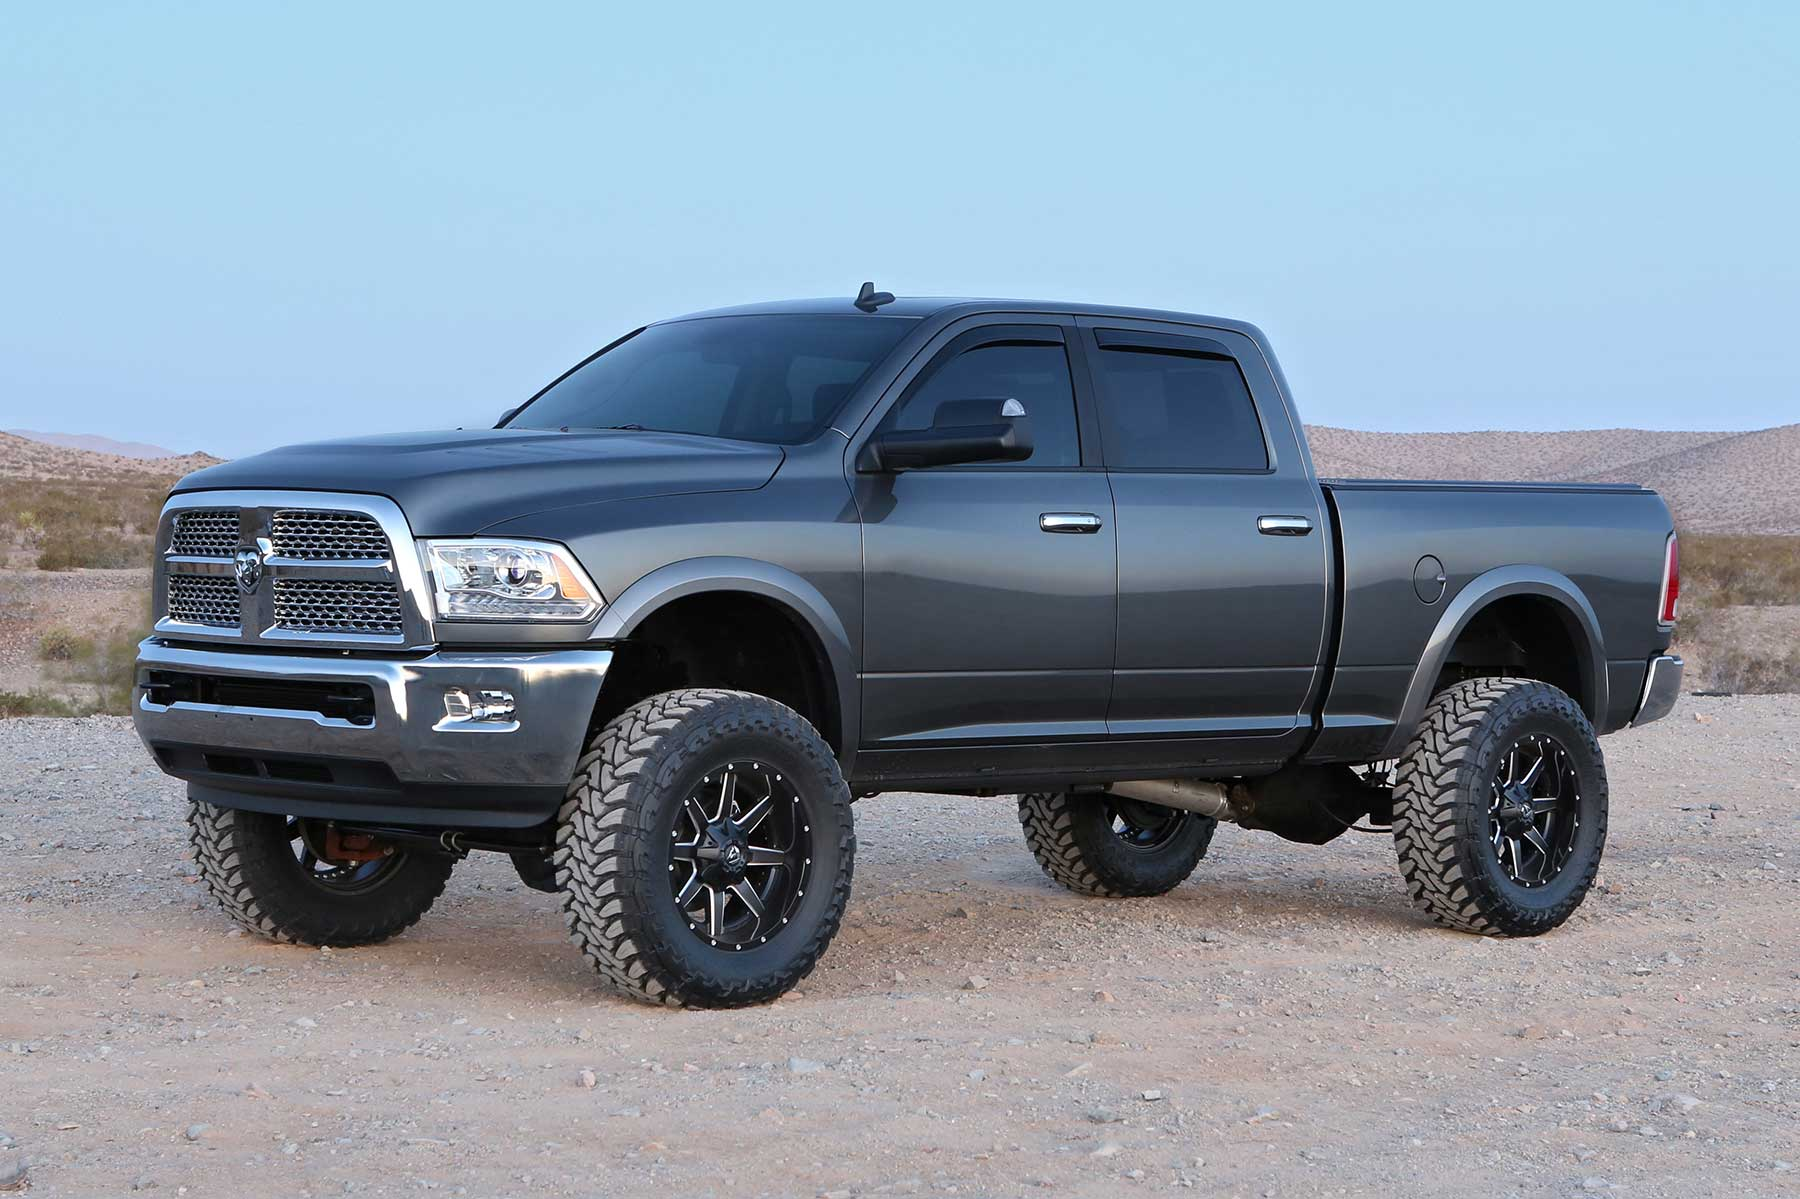 6 Inch Lift Kit For Dodge Ram 1500 4wd >> 6 Long Arm System W Performance Shocks K3035 Fabtech